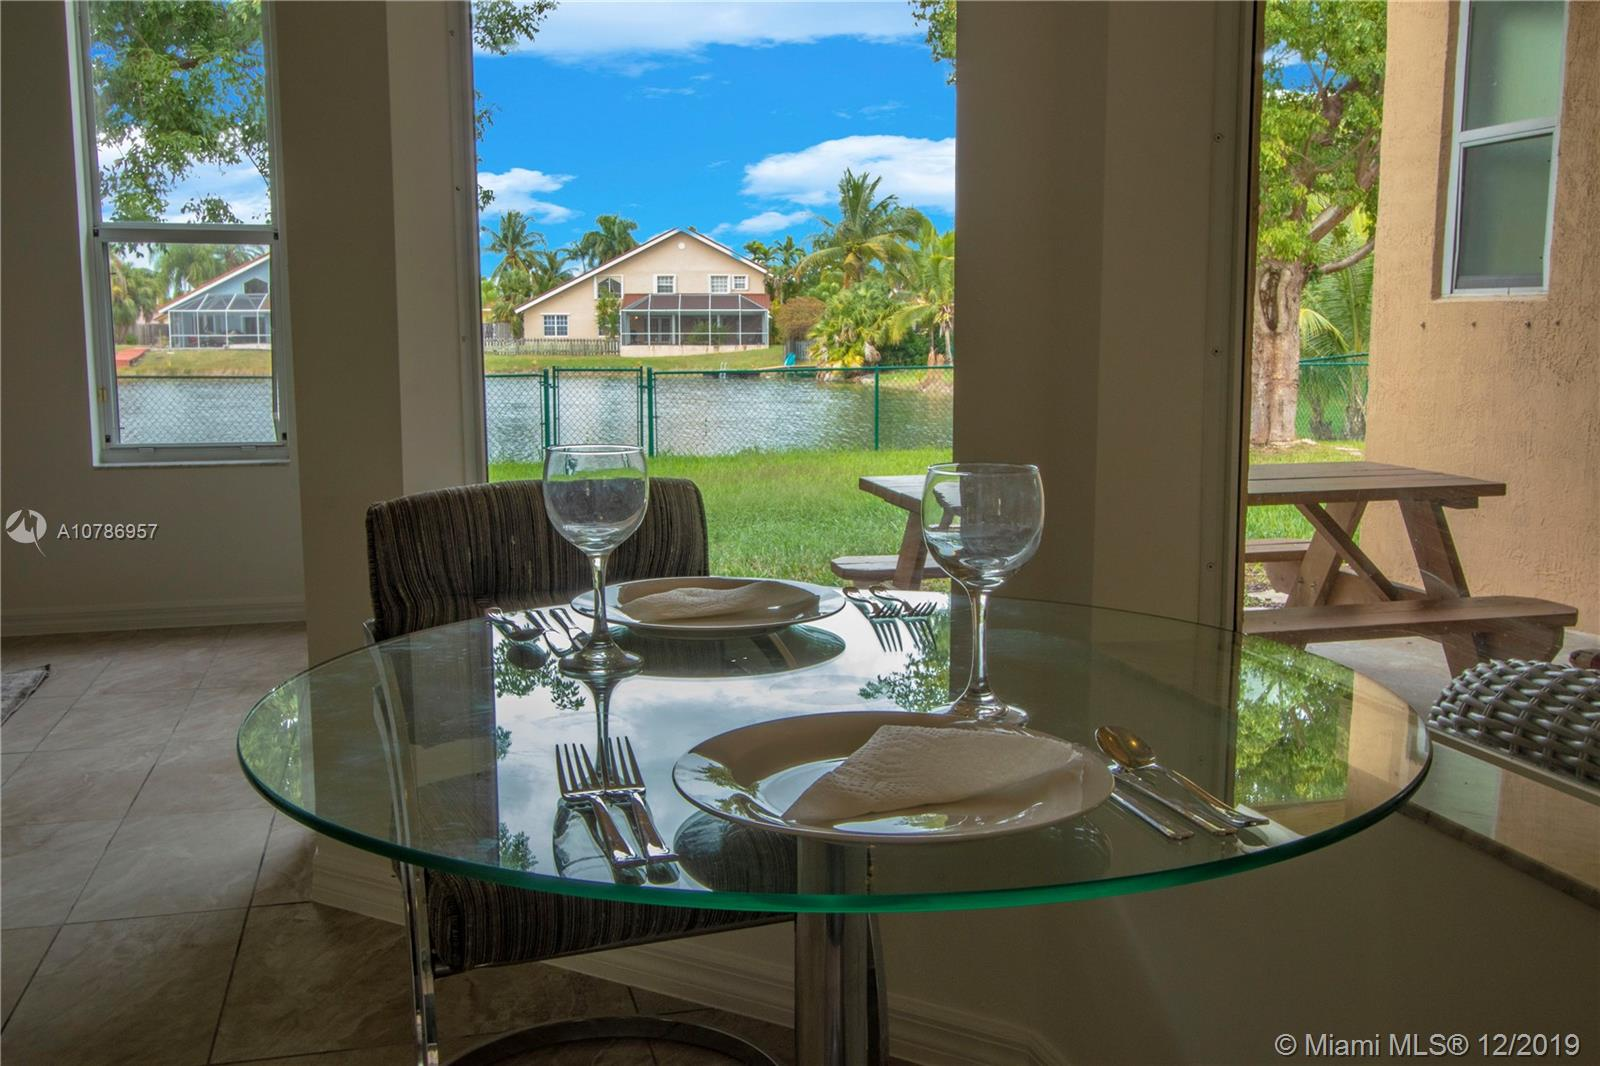 1467 SE 22nd Ln, Homestead, FL 33035 - Homestead, FL real estate listing